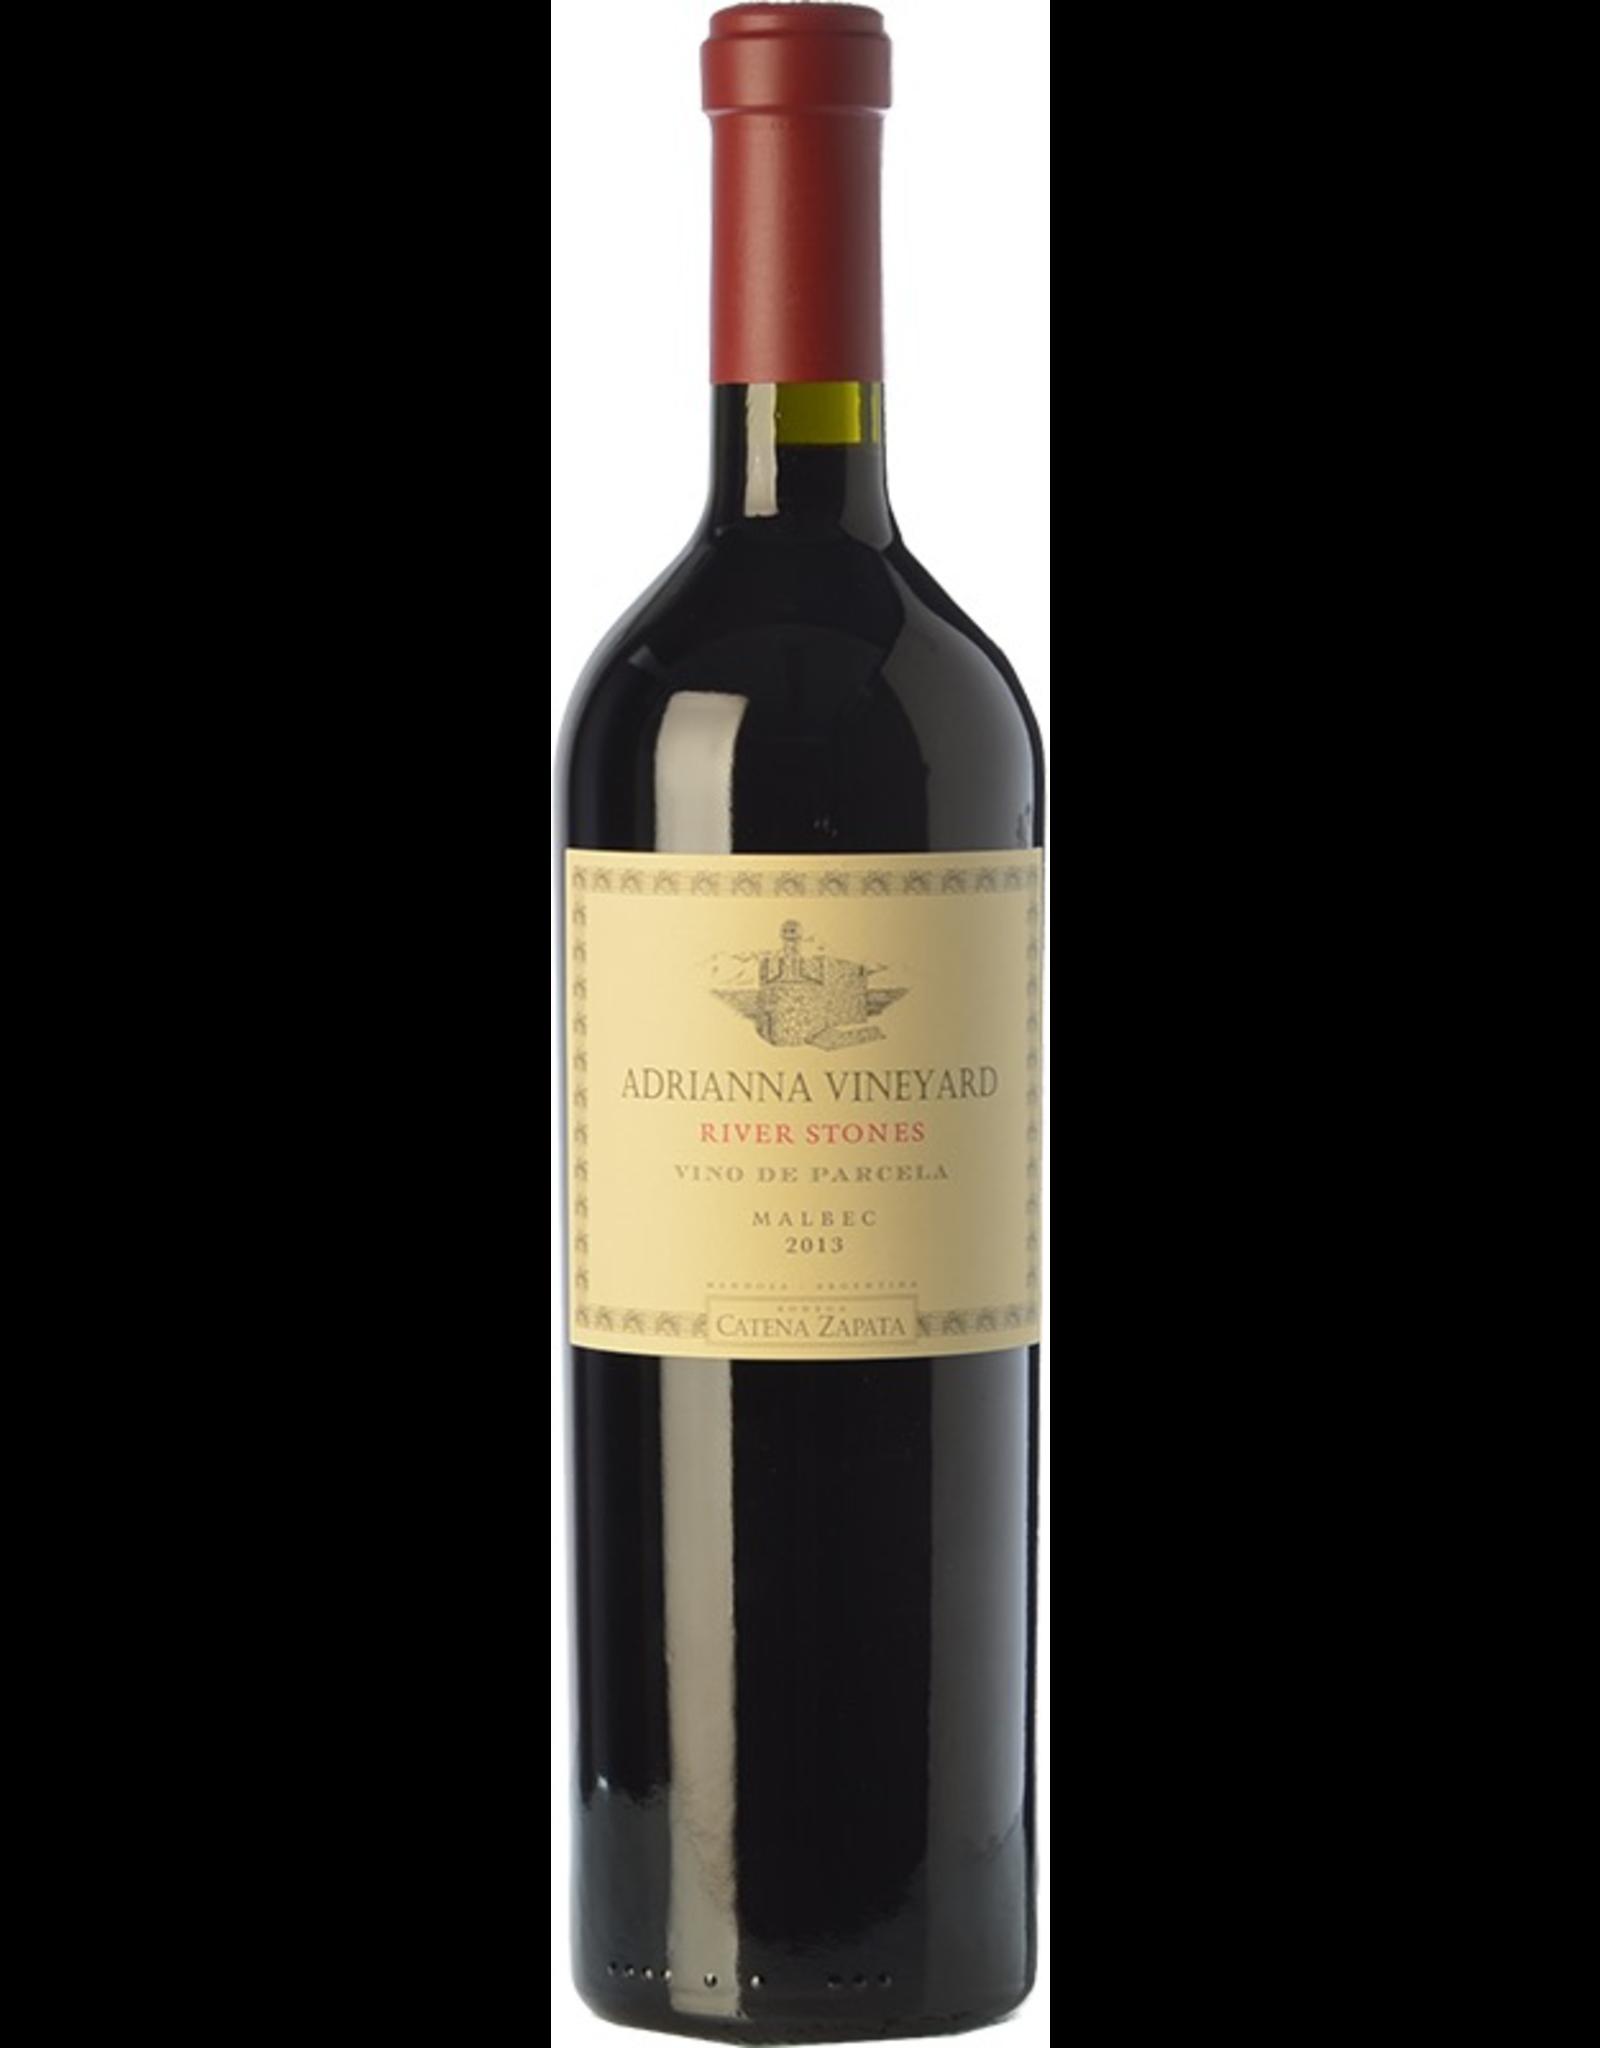 Red Wine 2015, Catena Zapata Adrianna Vineyard River Stones Parcel, Malbec, Lujan de Cuyo, Mendoza, Argentina, 14% Alc, CTnr JS96 RP95